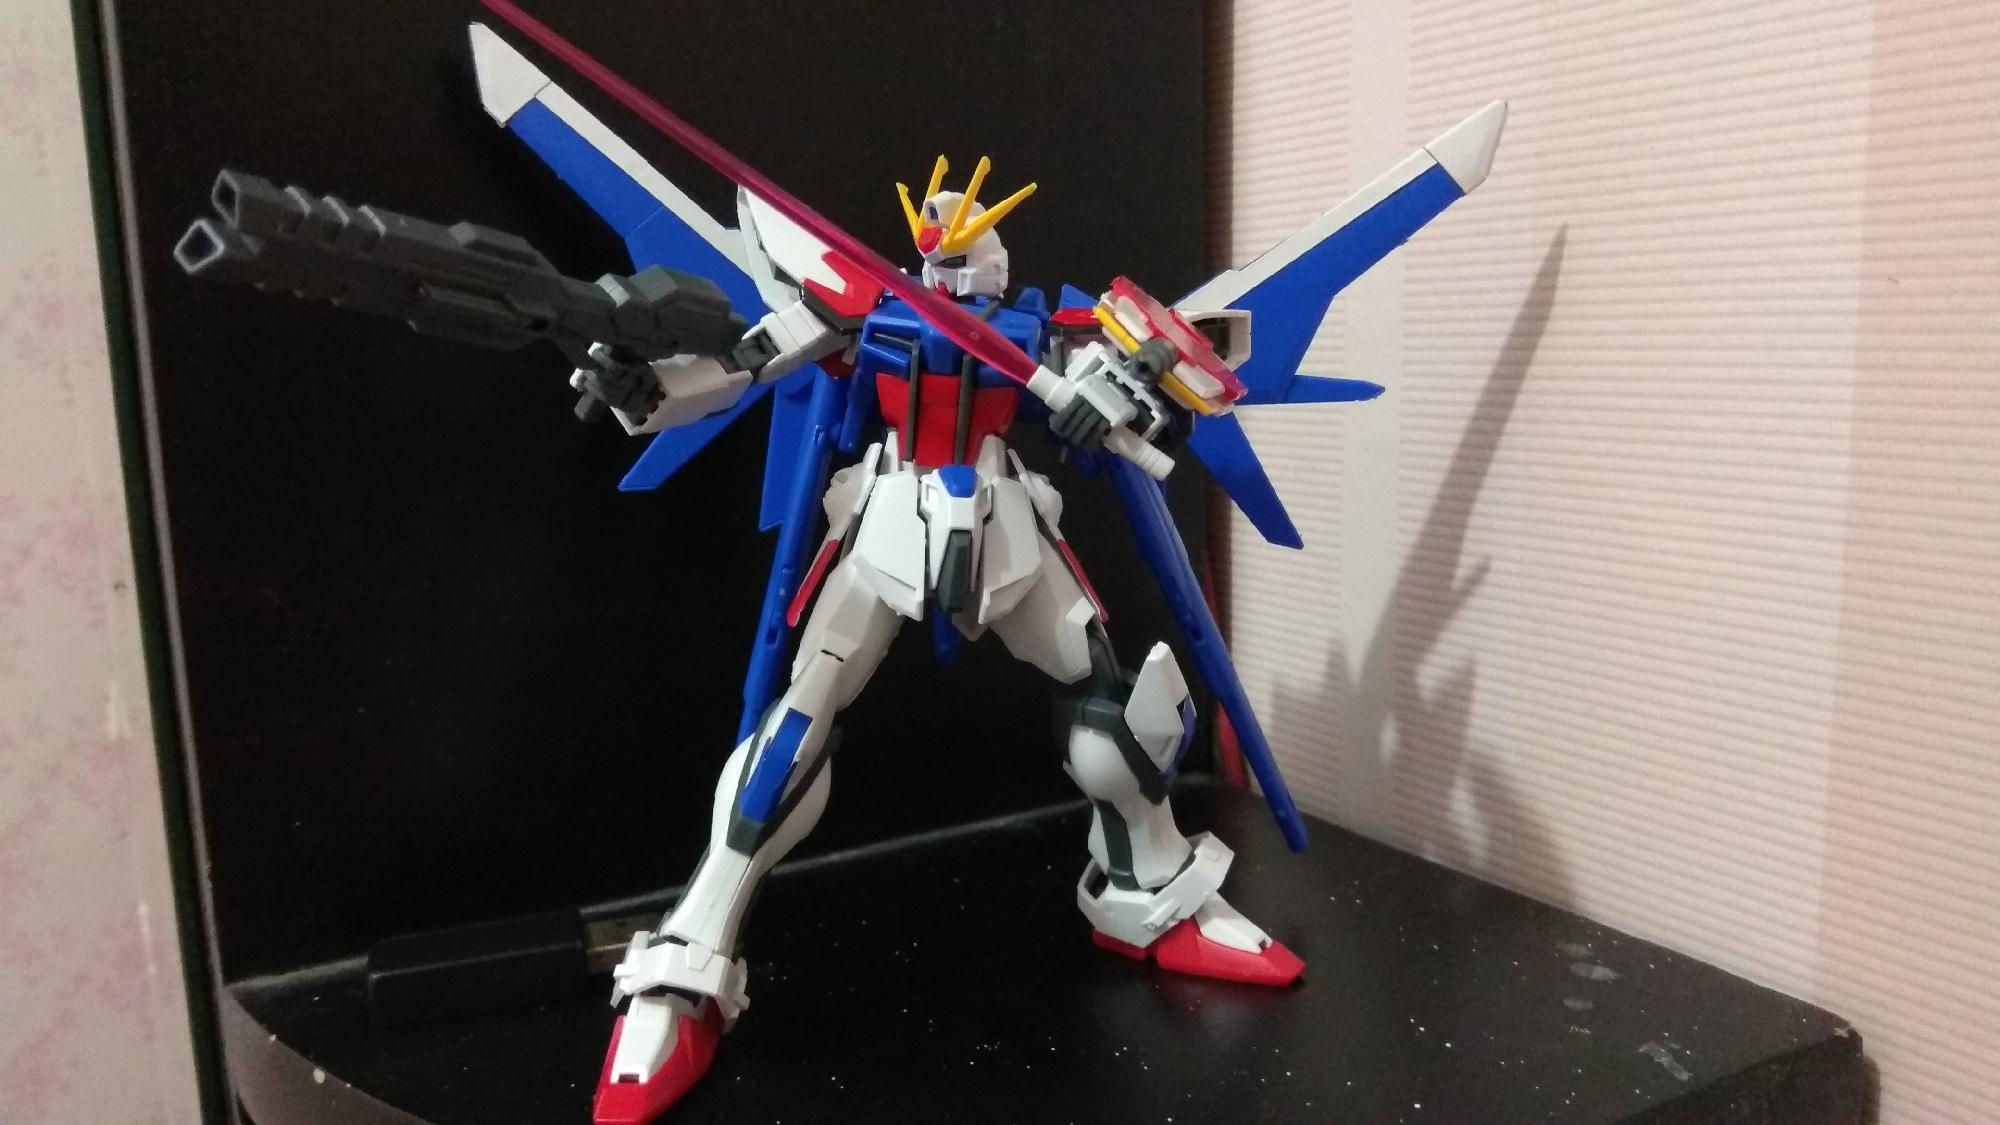 HG 1/144 Gundam Star Build Strike Sei Iori